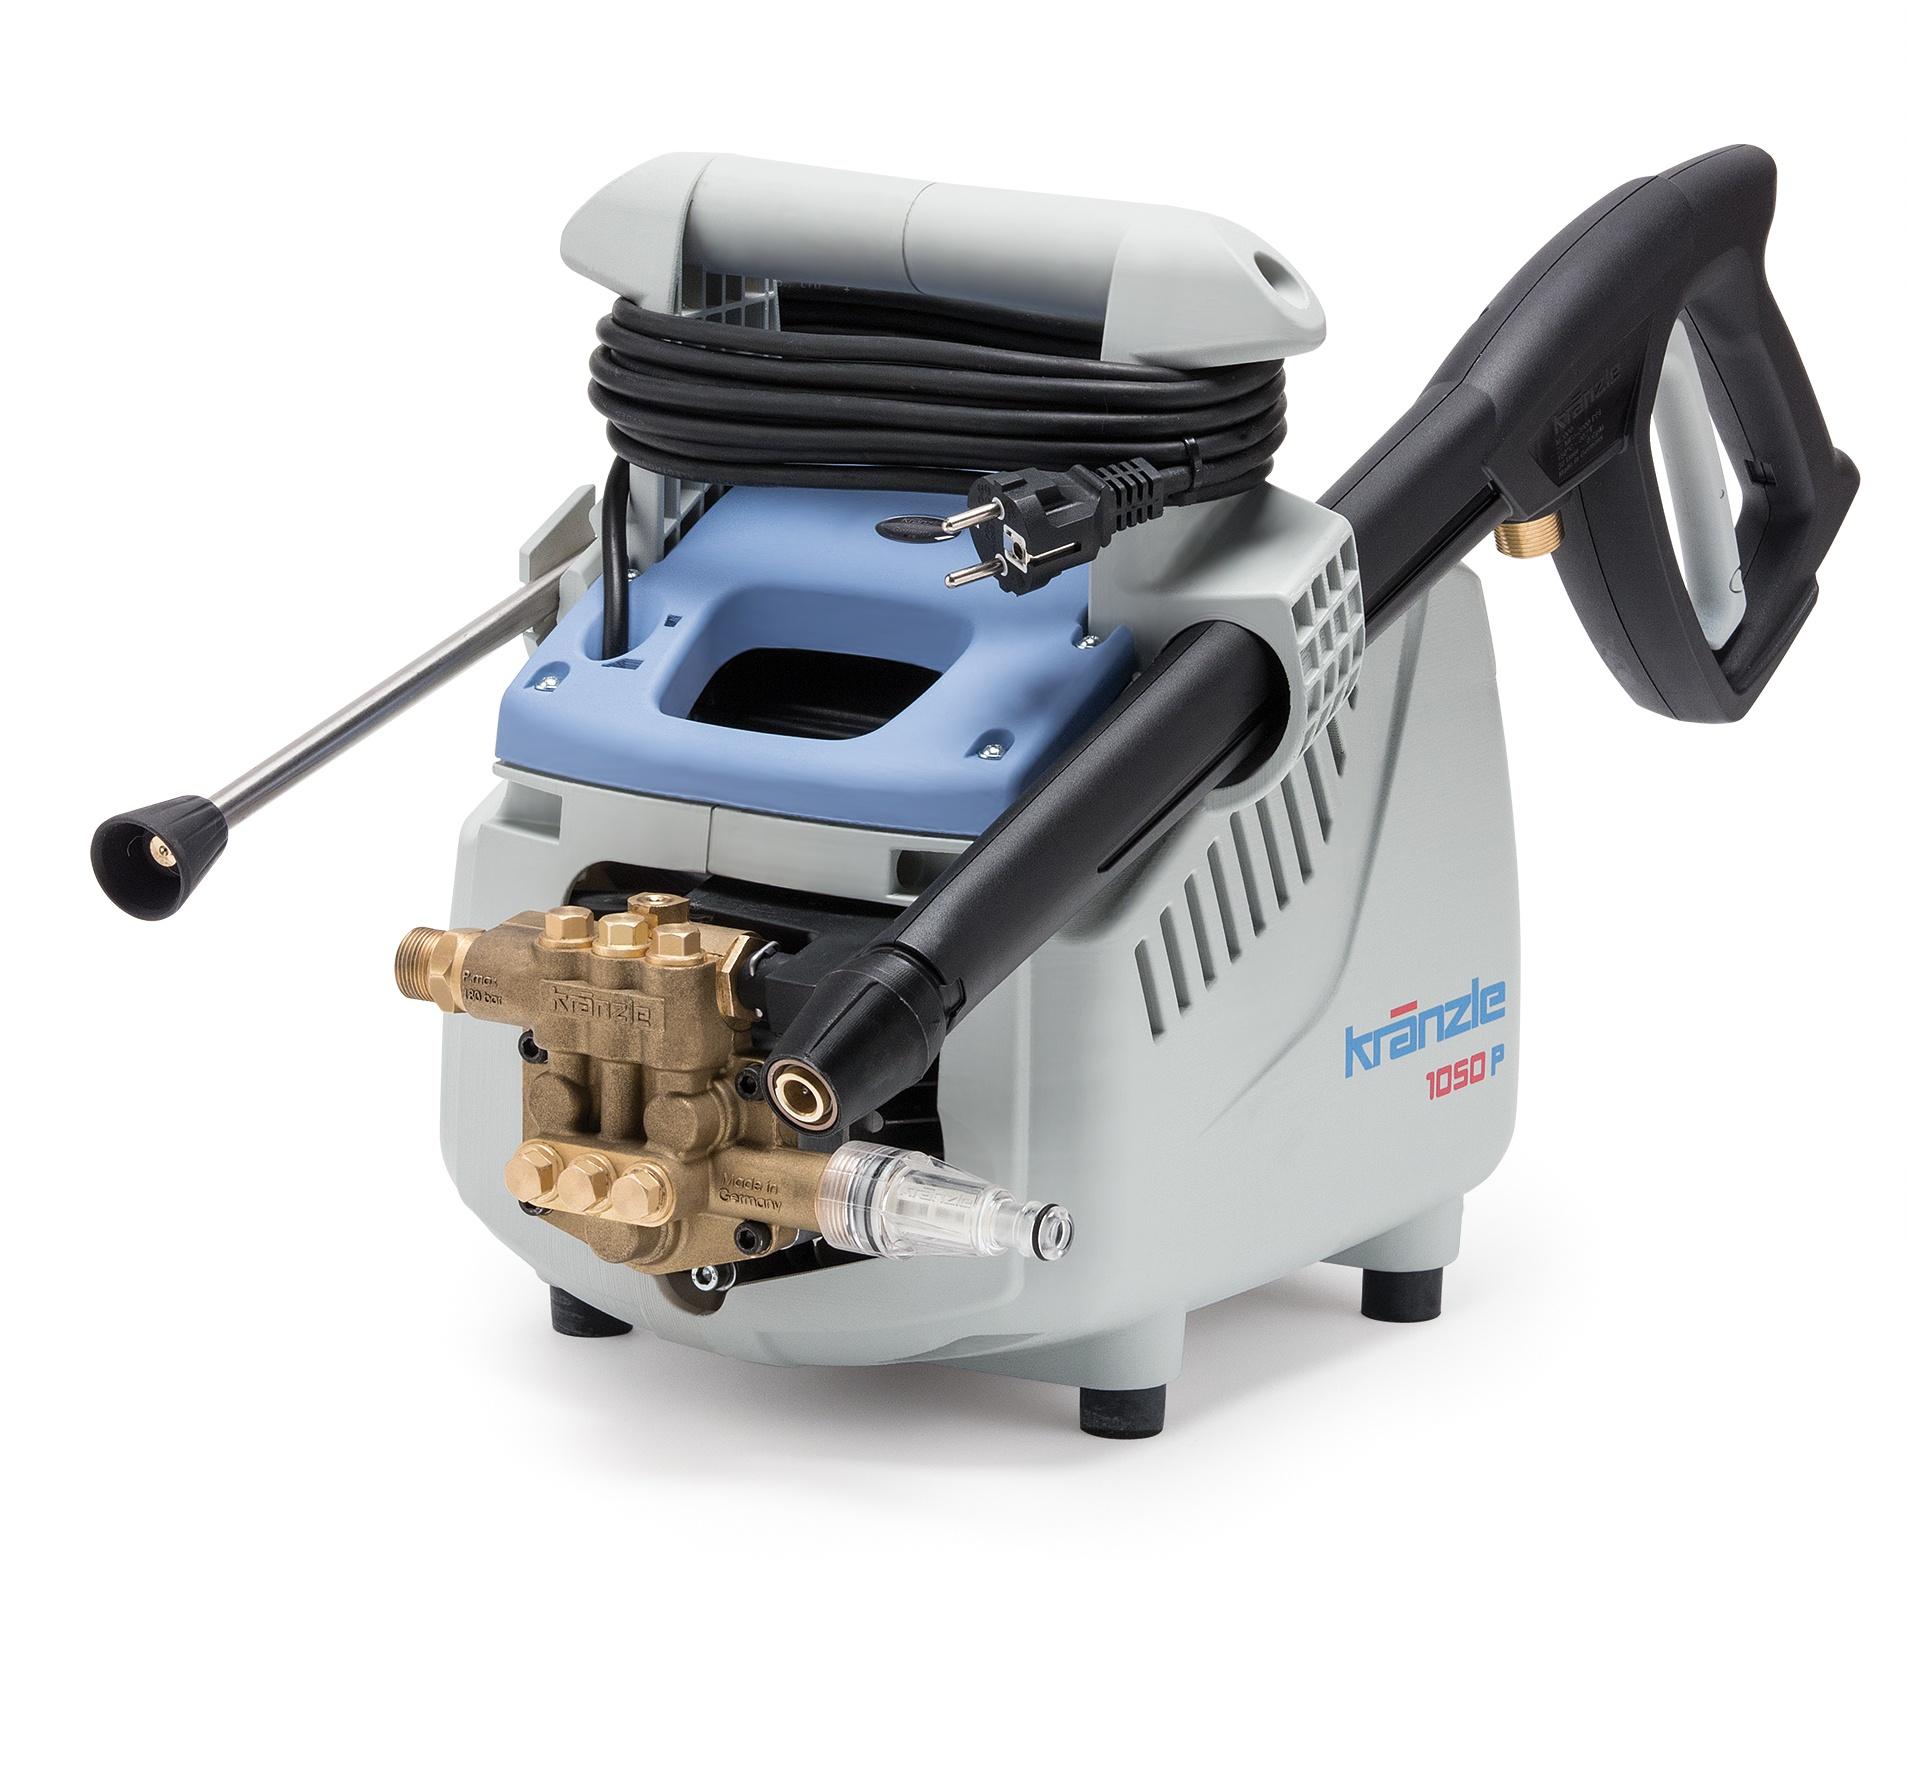 Nettoyeur haute pression KRANZLE K 1050 P